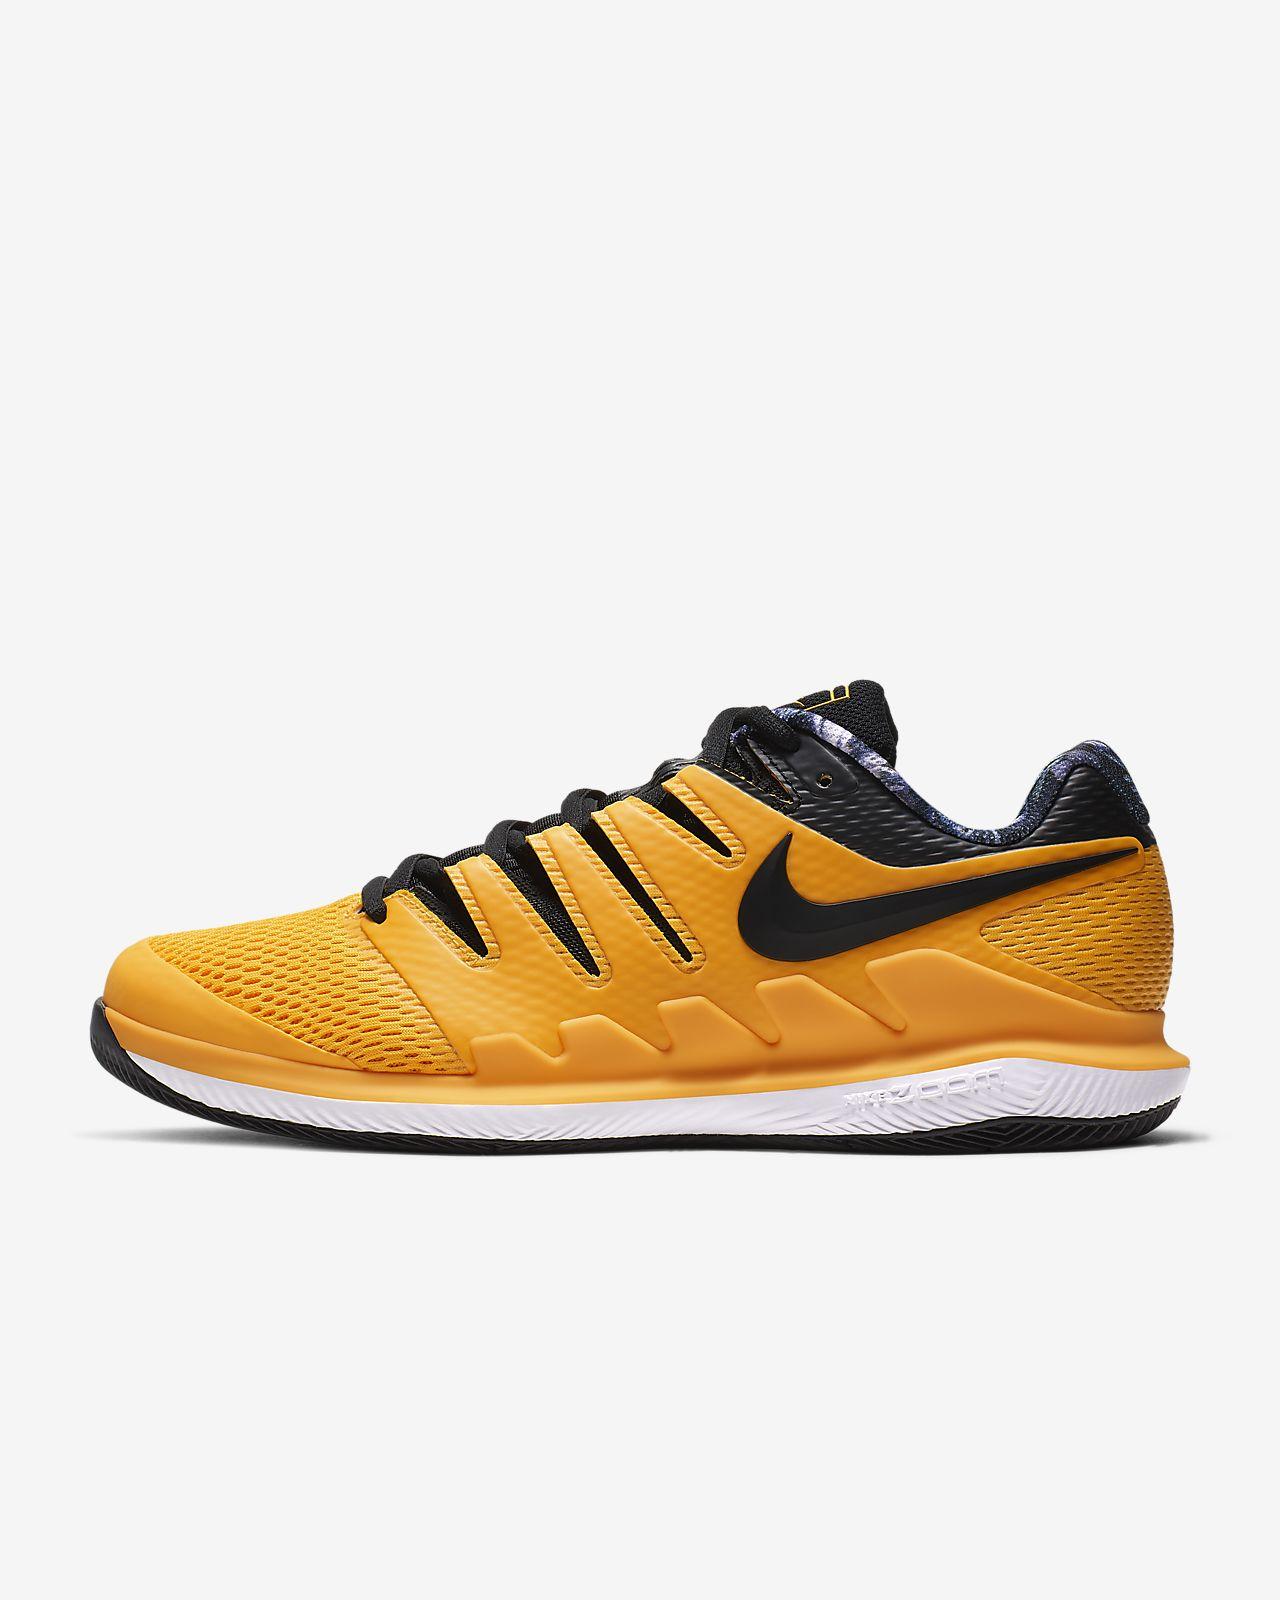 NikeCourt Air Zoom Vapor X Herren-Tennisschuh für Hartplätze